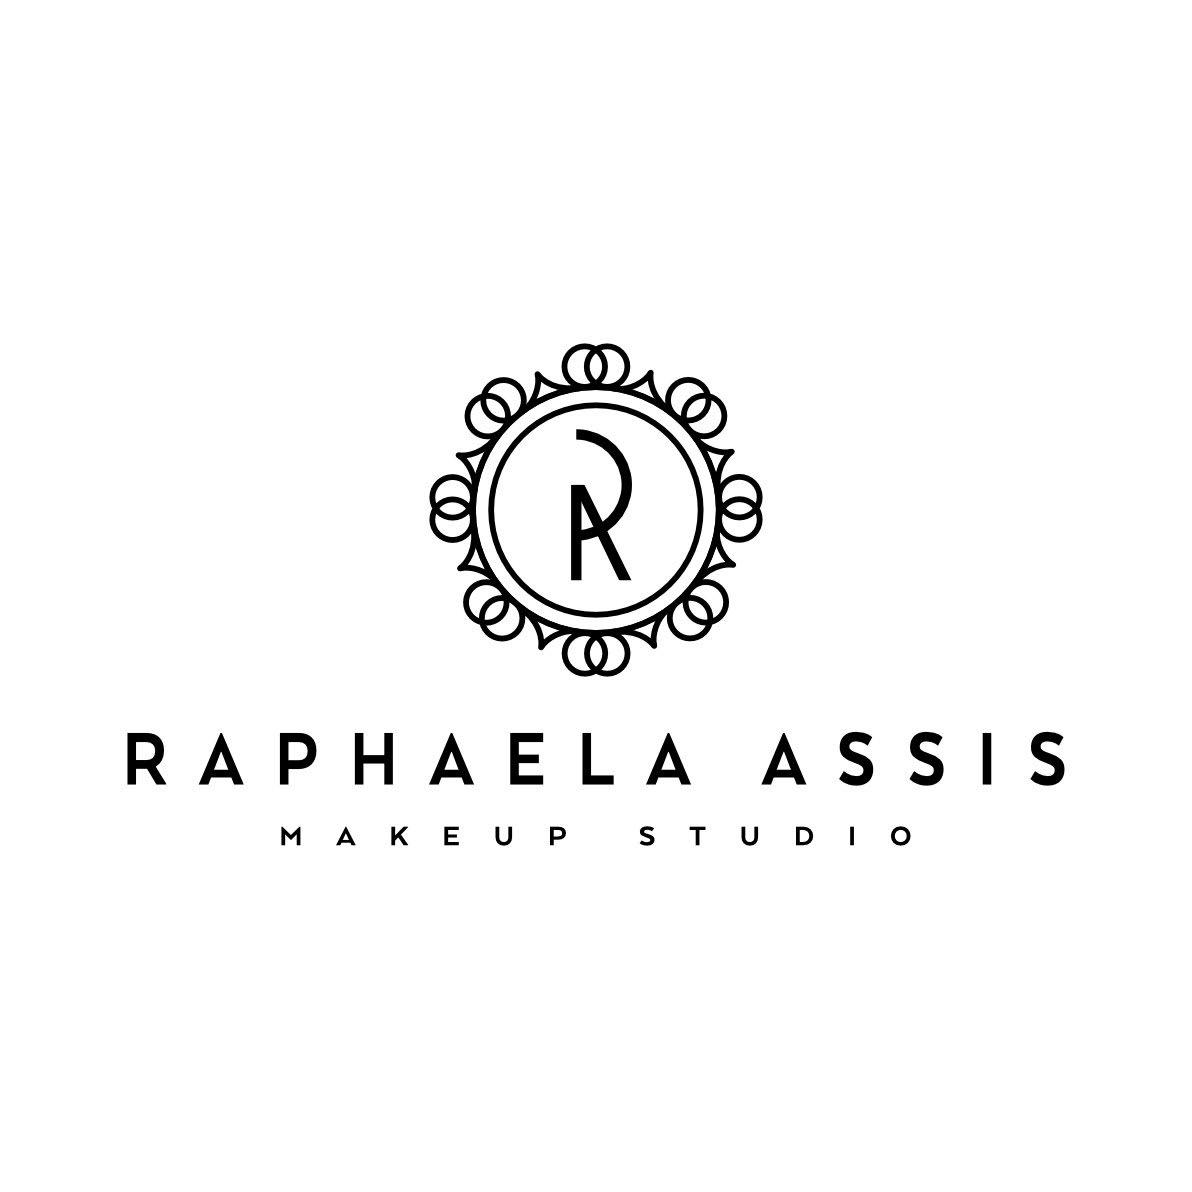 Raphaela Assis Makeup Estudio